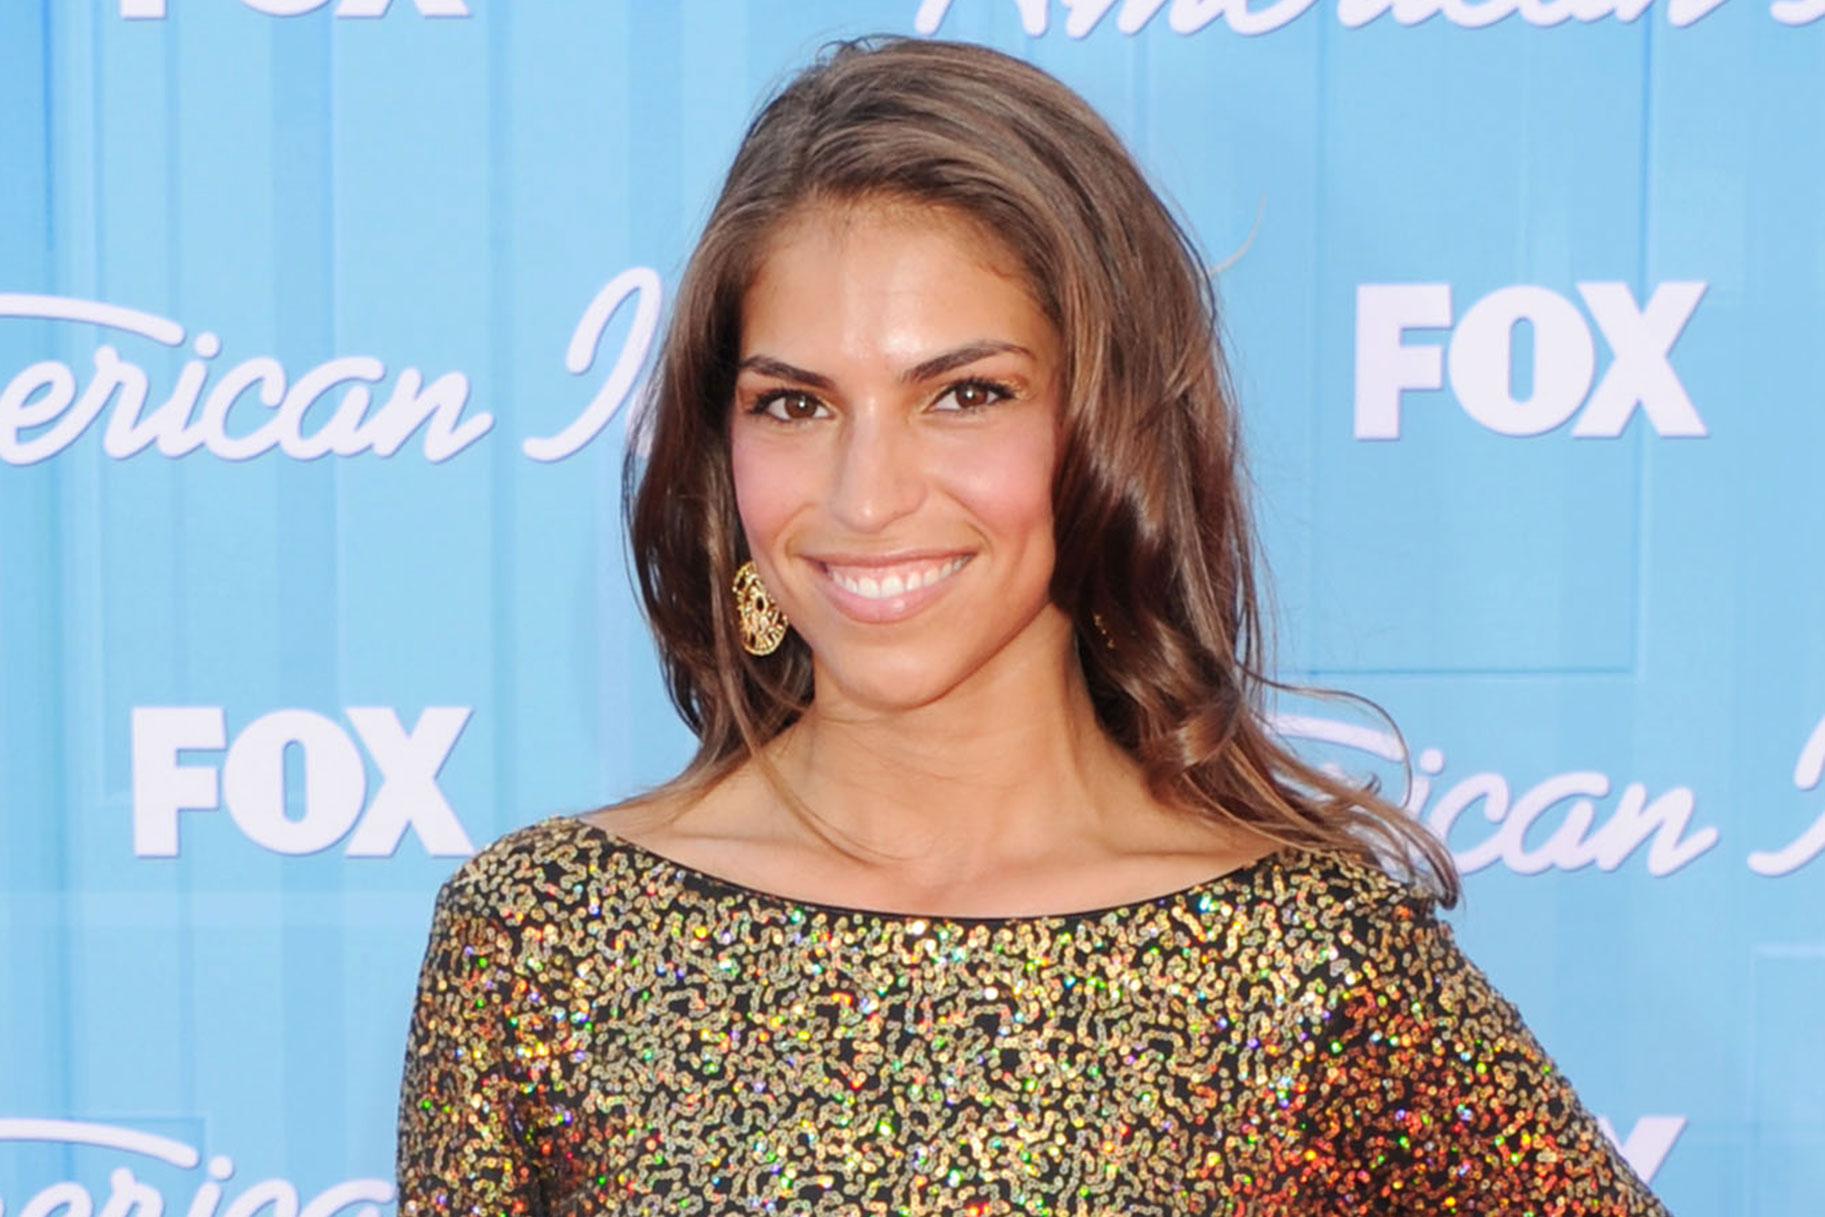 Antonella Sexo former 'american idol' star antonella barba pleads guilty in